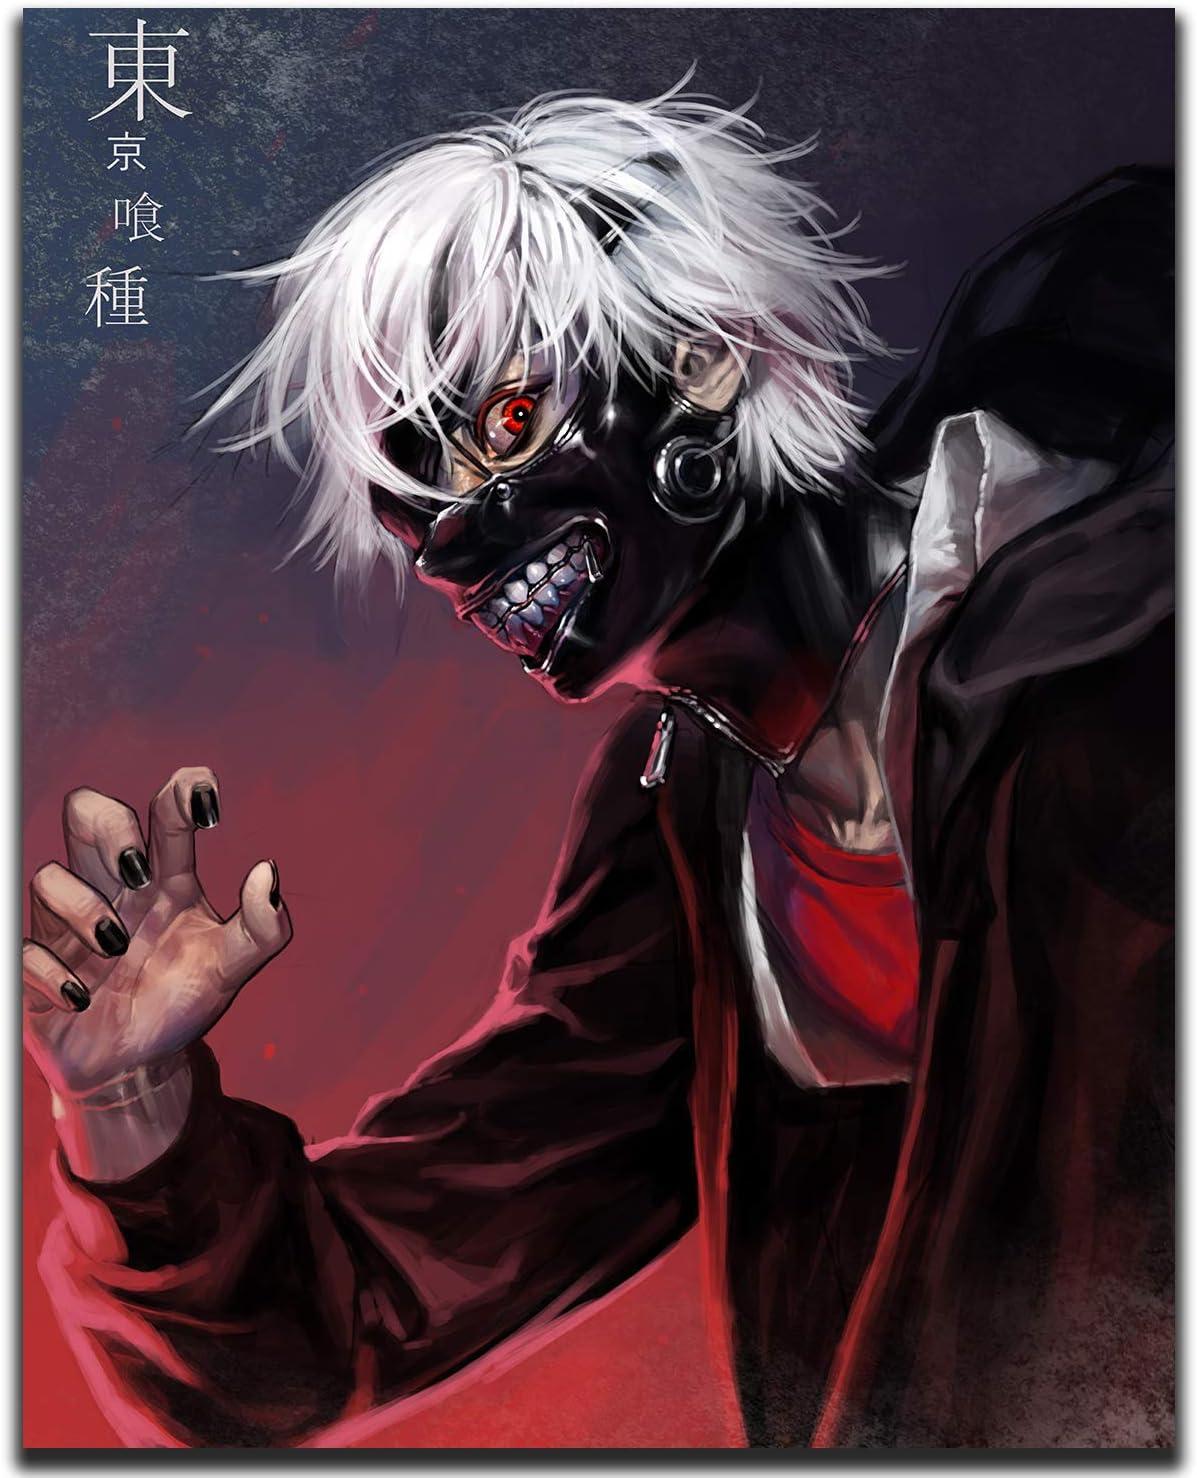 Amazon.com : SUPERIOR POSTER - Tokyo Ghoul - Anime Manga Art Wall ...